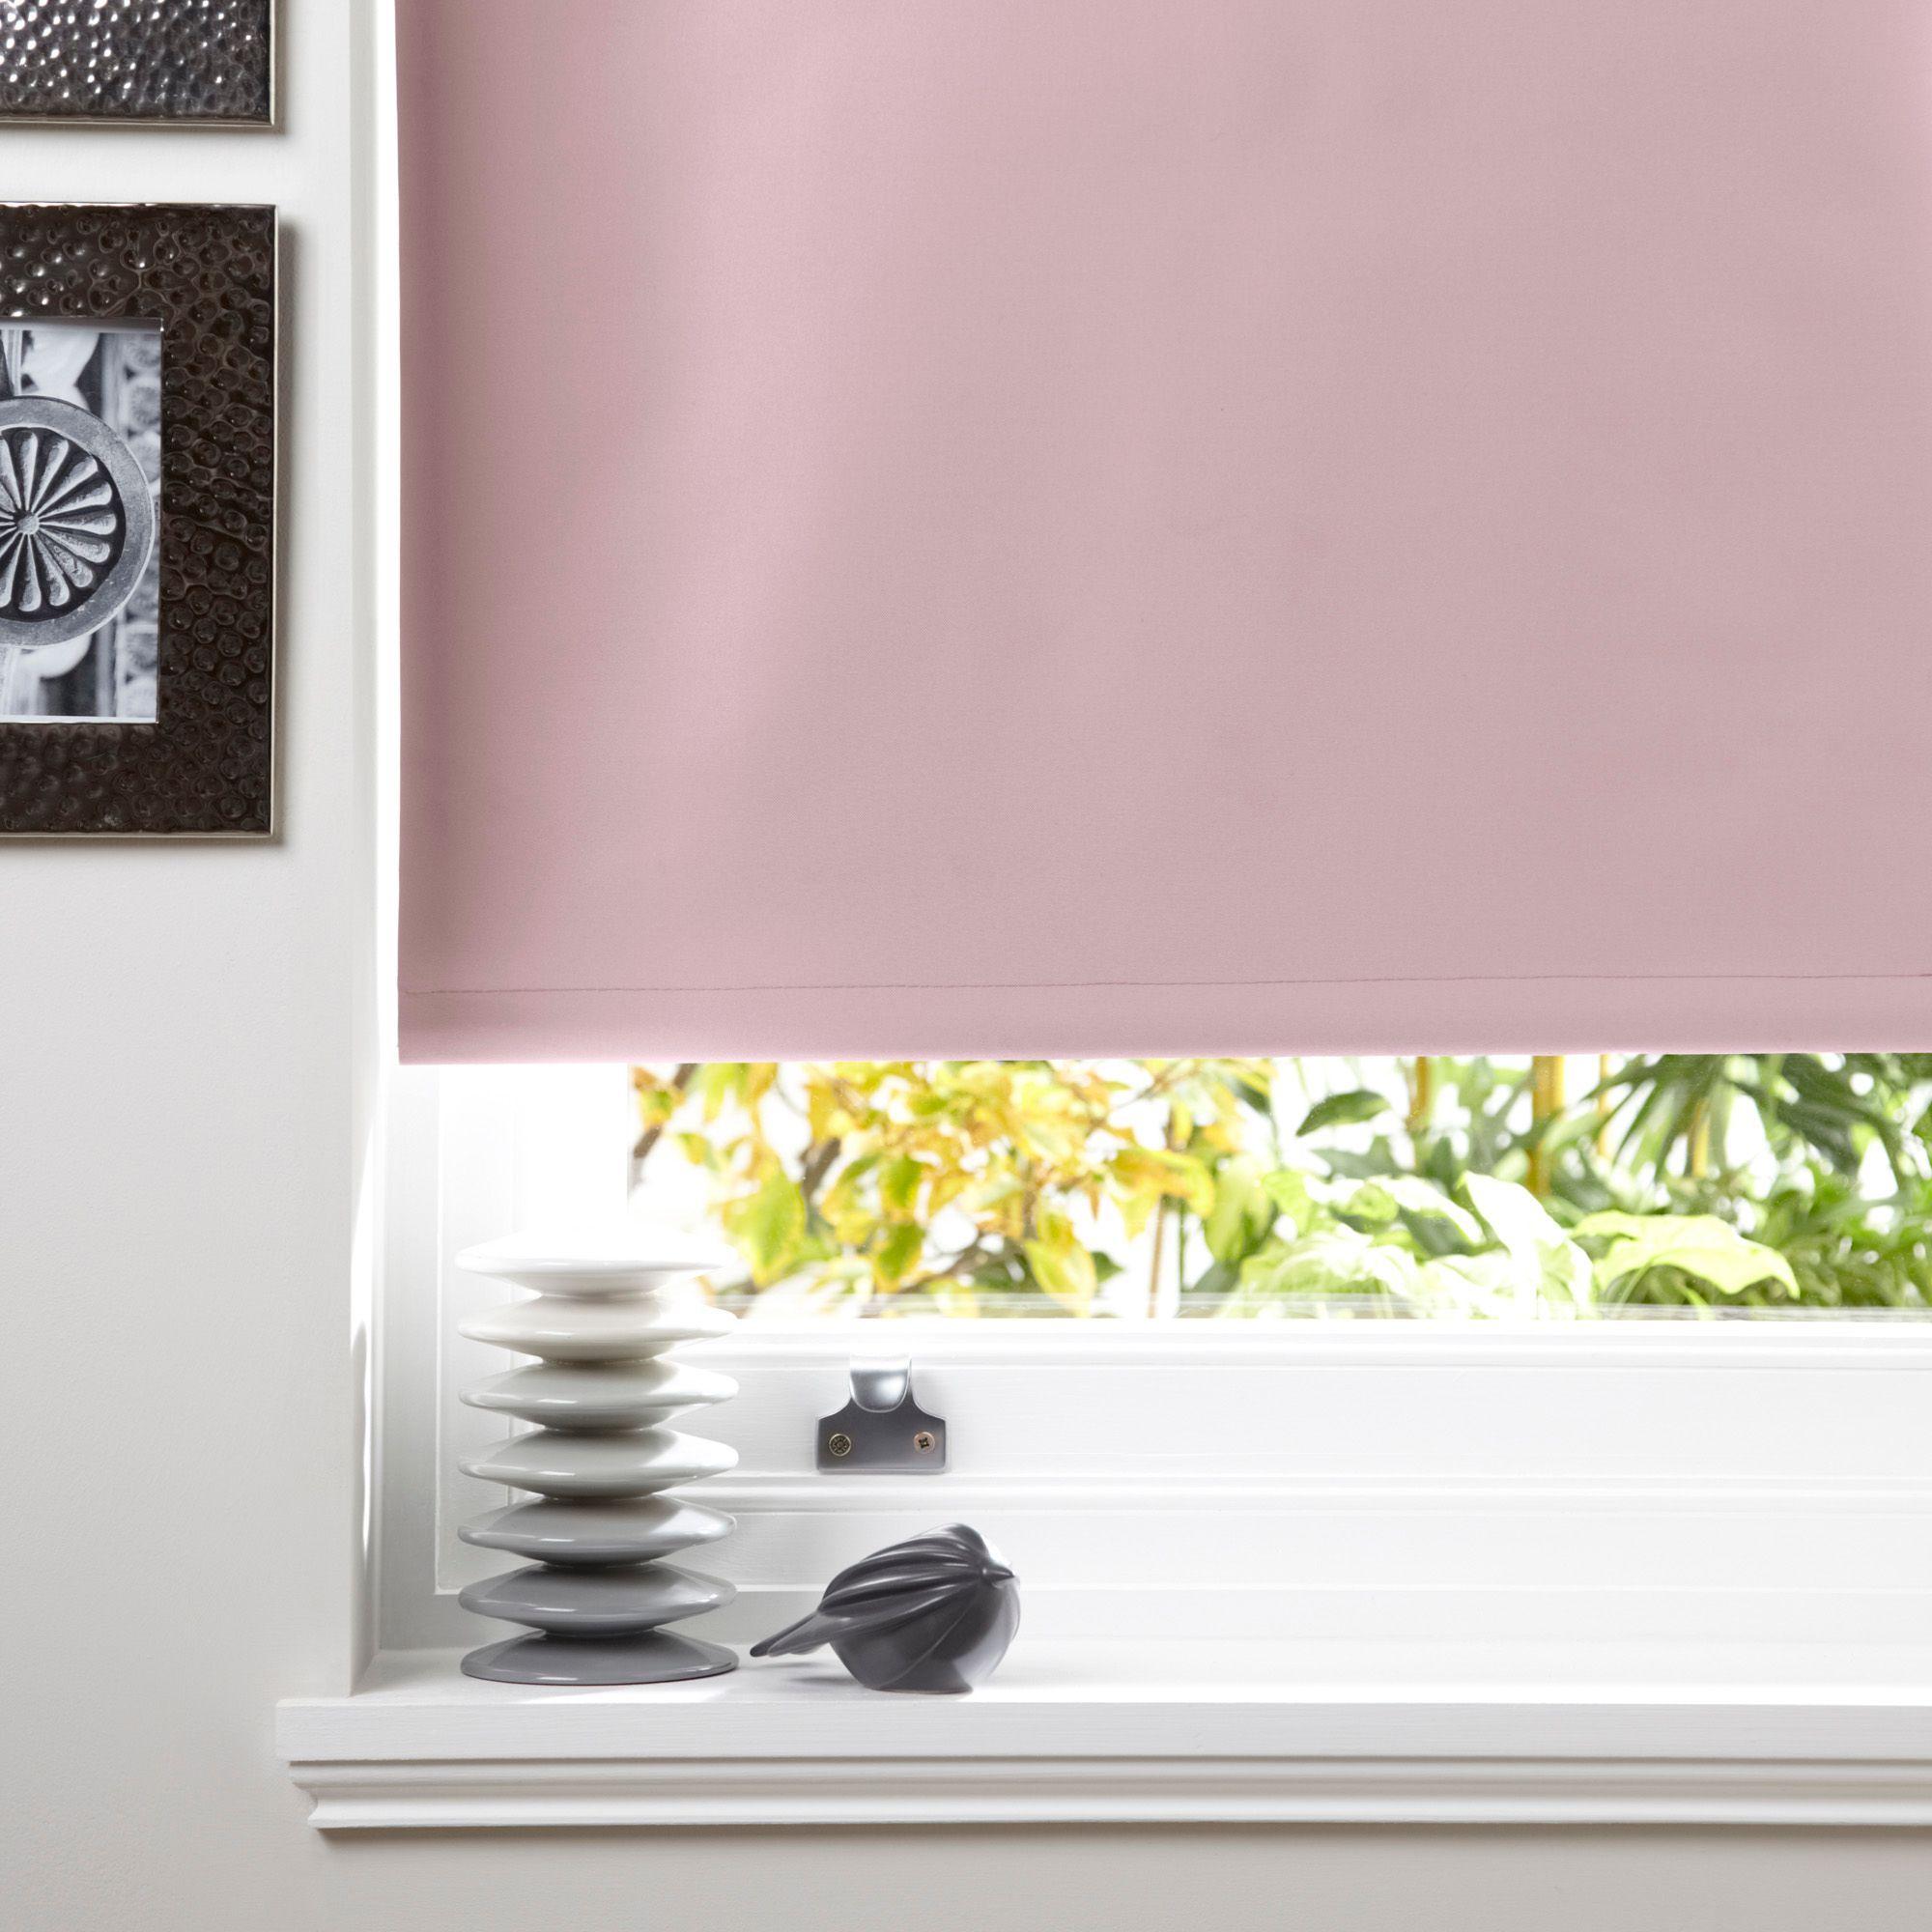 Colours Kona Light Pink Roller Blind L 1 6m W 600mm Departments Diy At B Q From 7 98 Blinds White Roller Blinds Blue Roller Blinds